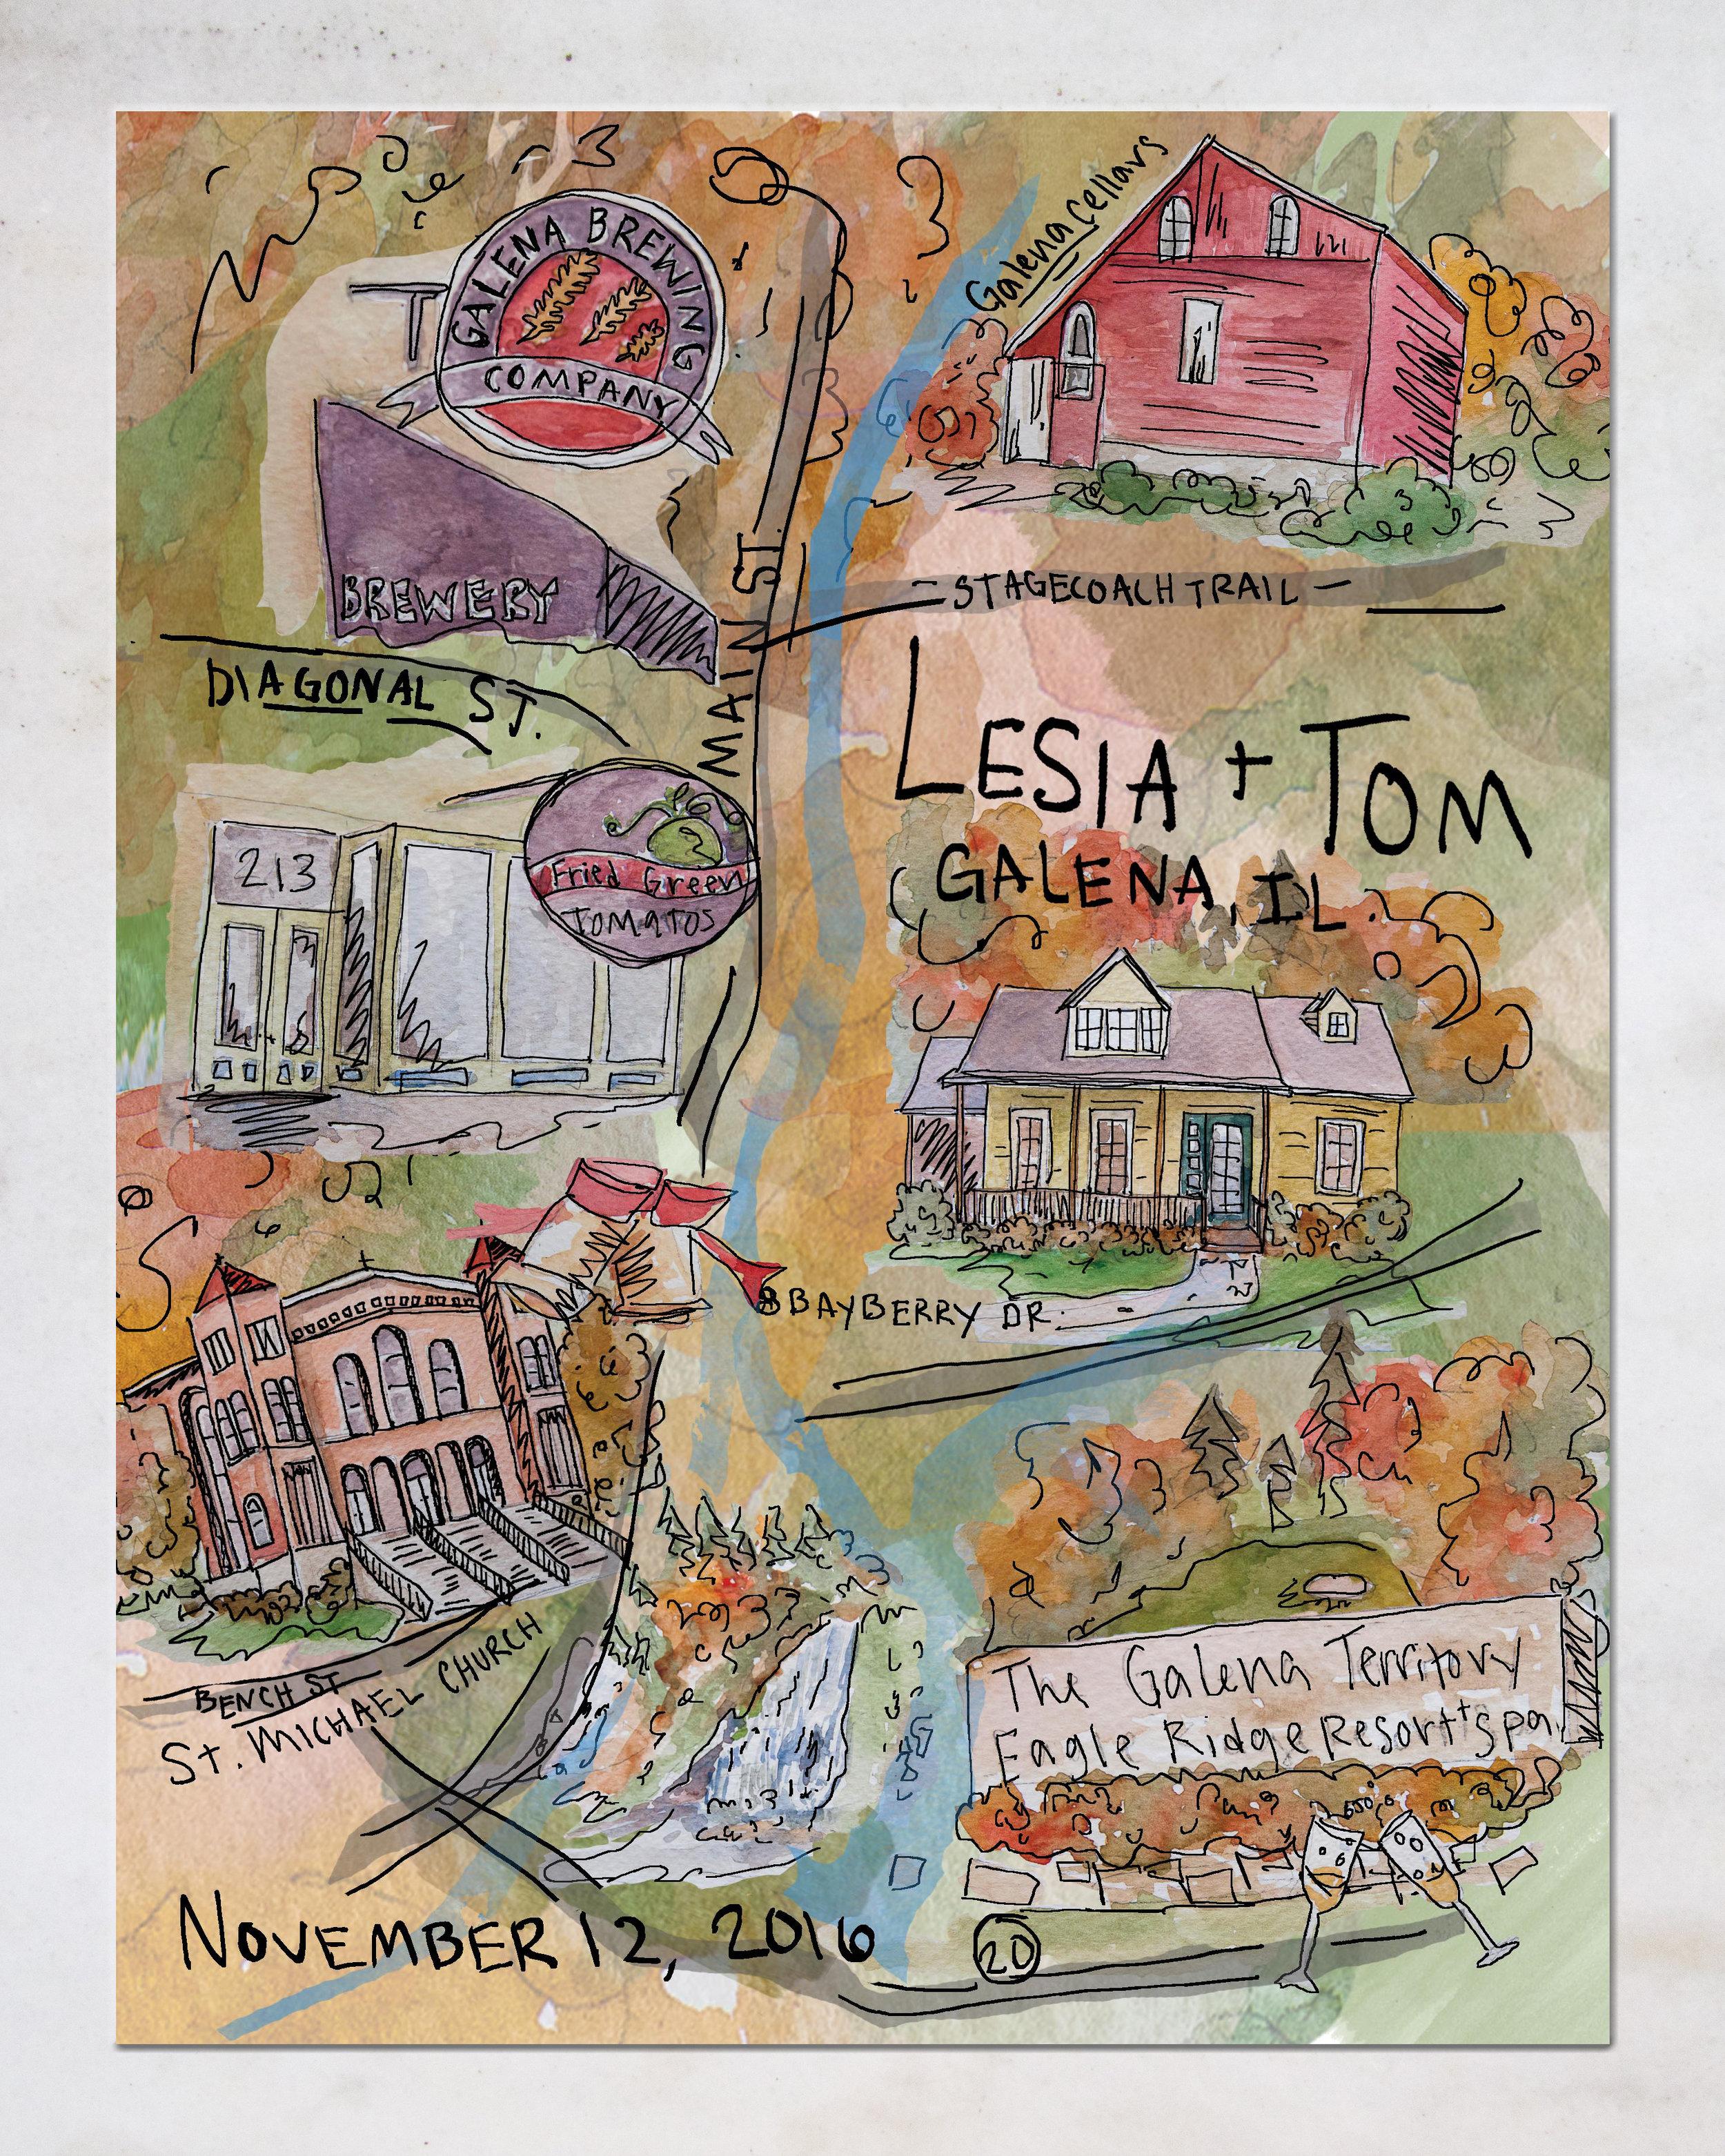 Galena, Illinois Bespoke Wedding Map, 2016.